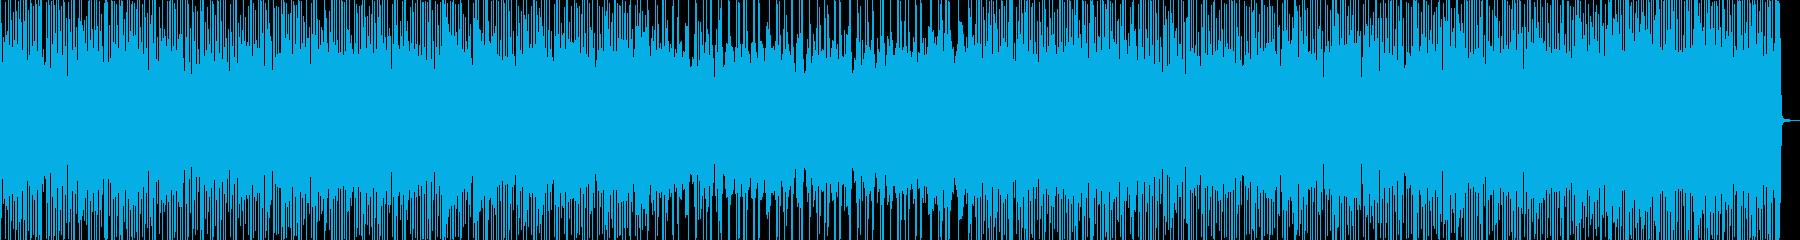 Cool, fashionable, trap BGM's reproduced waveform